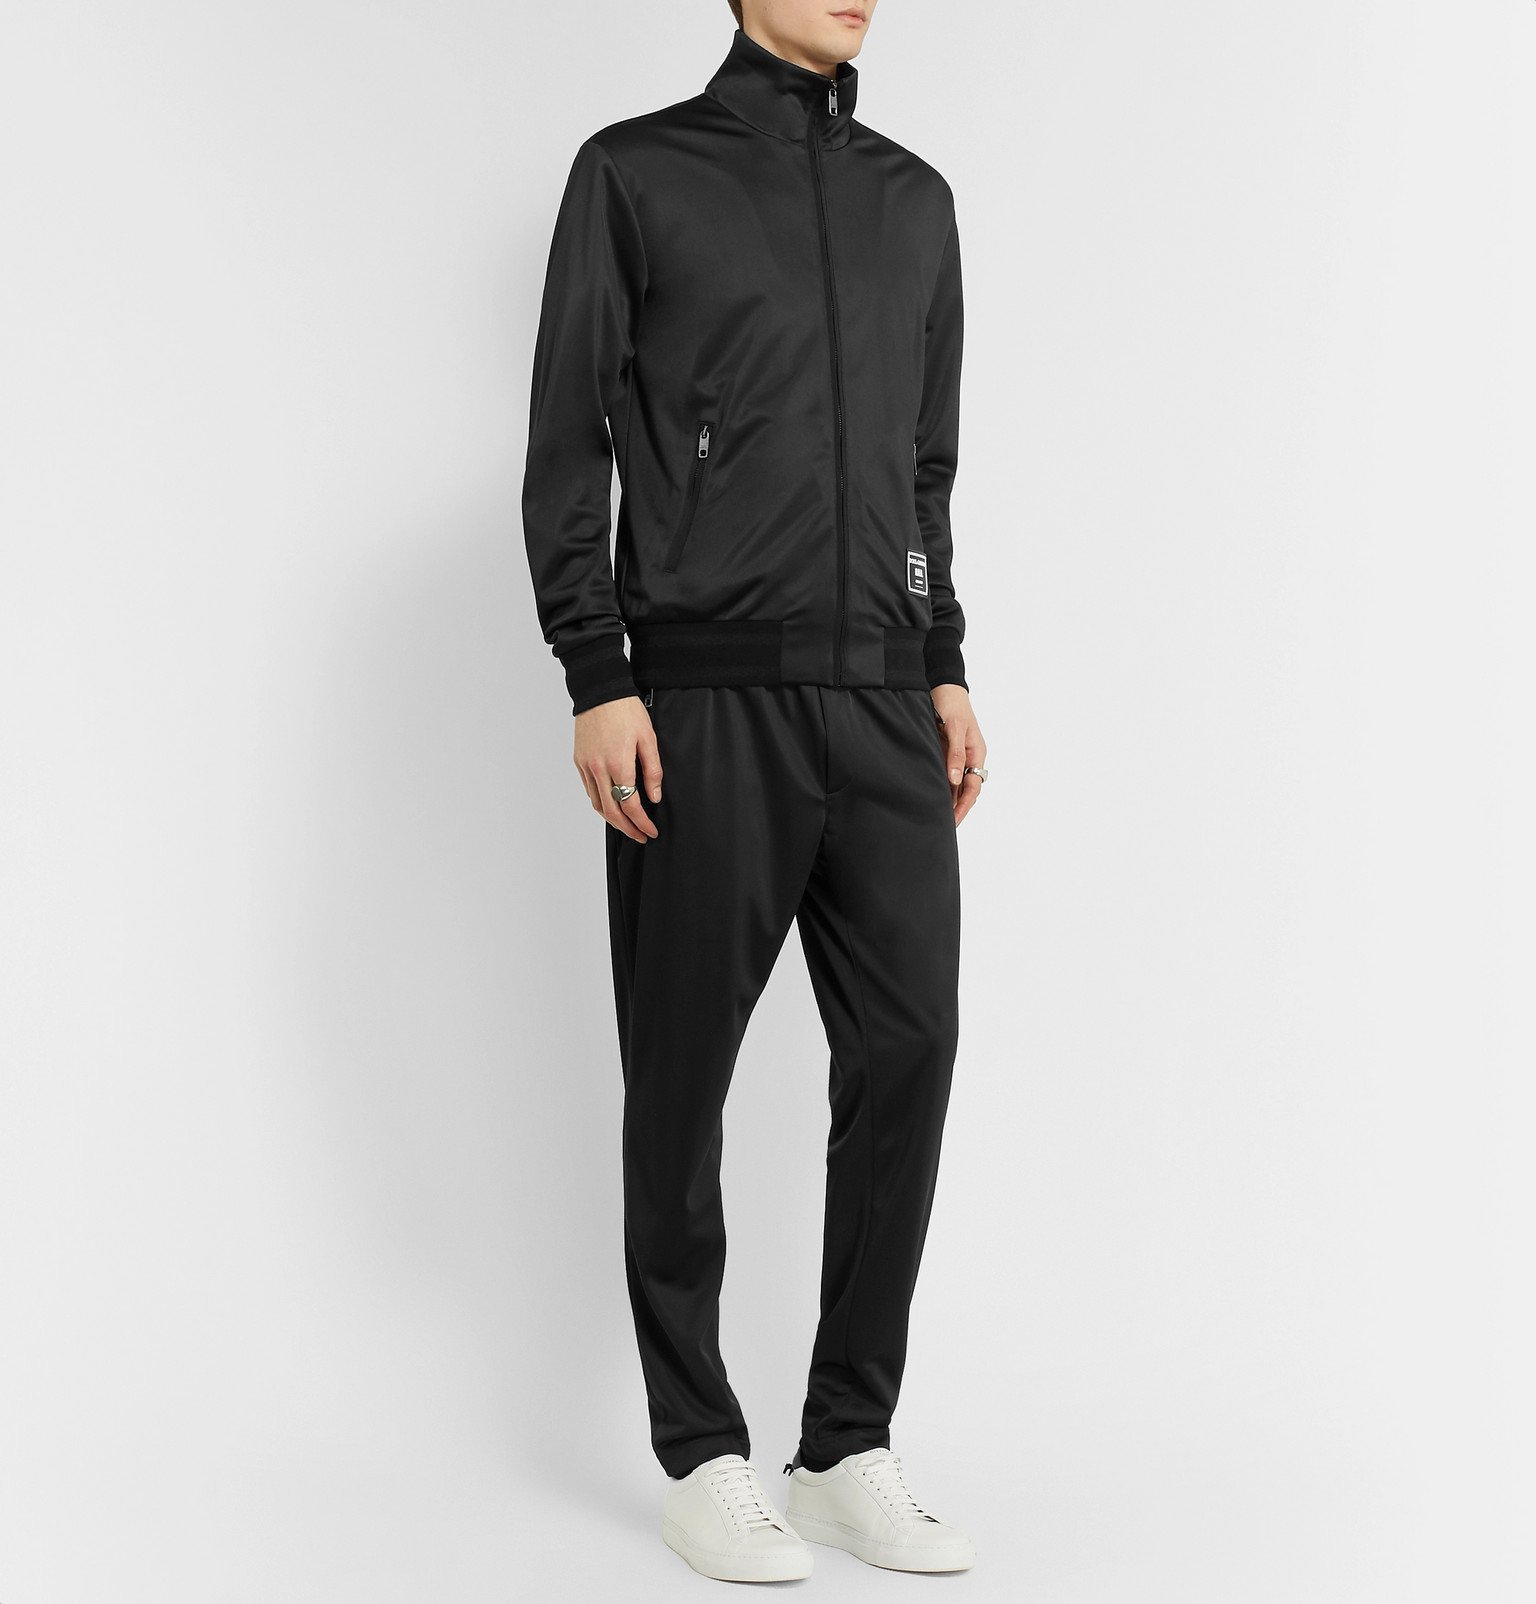 Dolce & Gabbana - Slim-Fit Logo-Appliquéd Satin-Jersey Track Jacket - Black